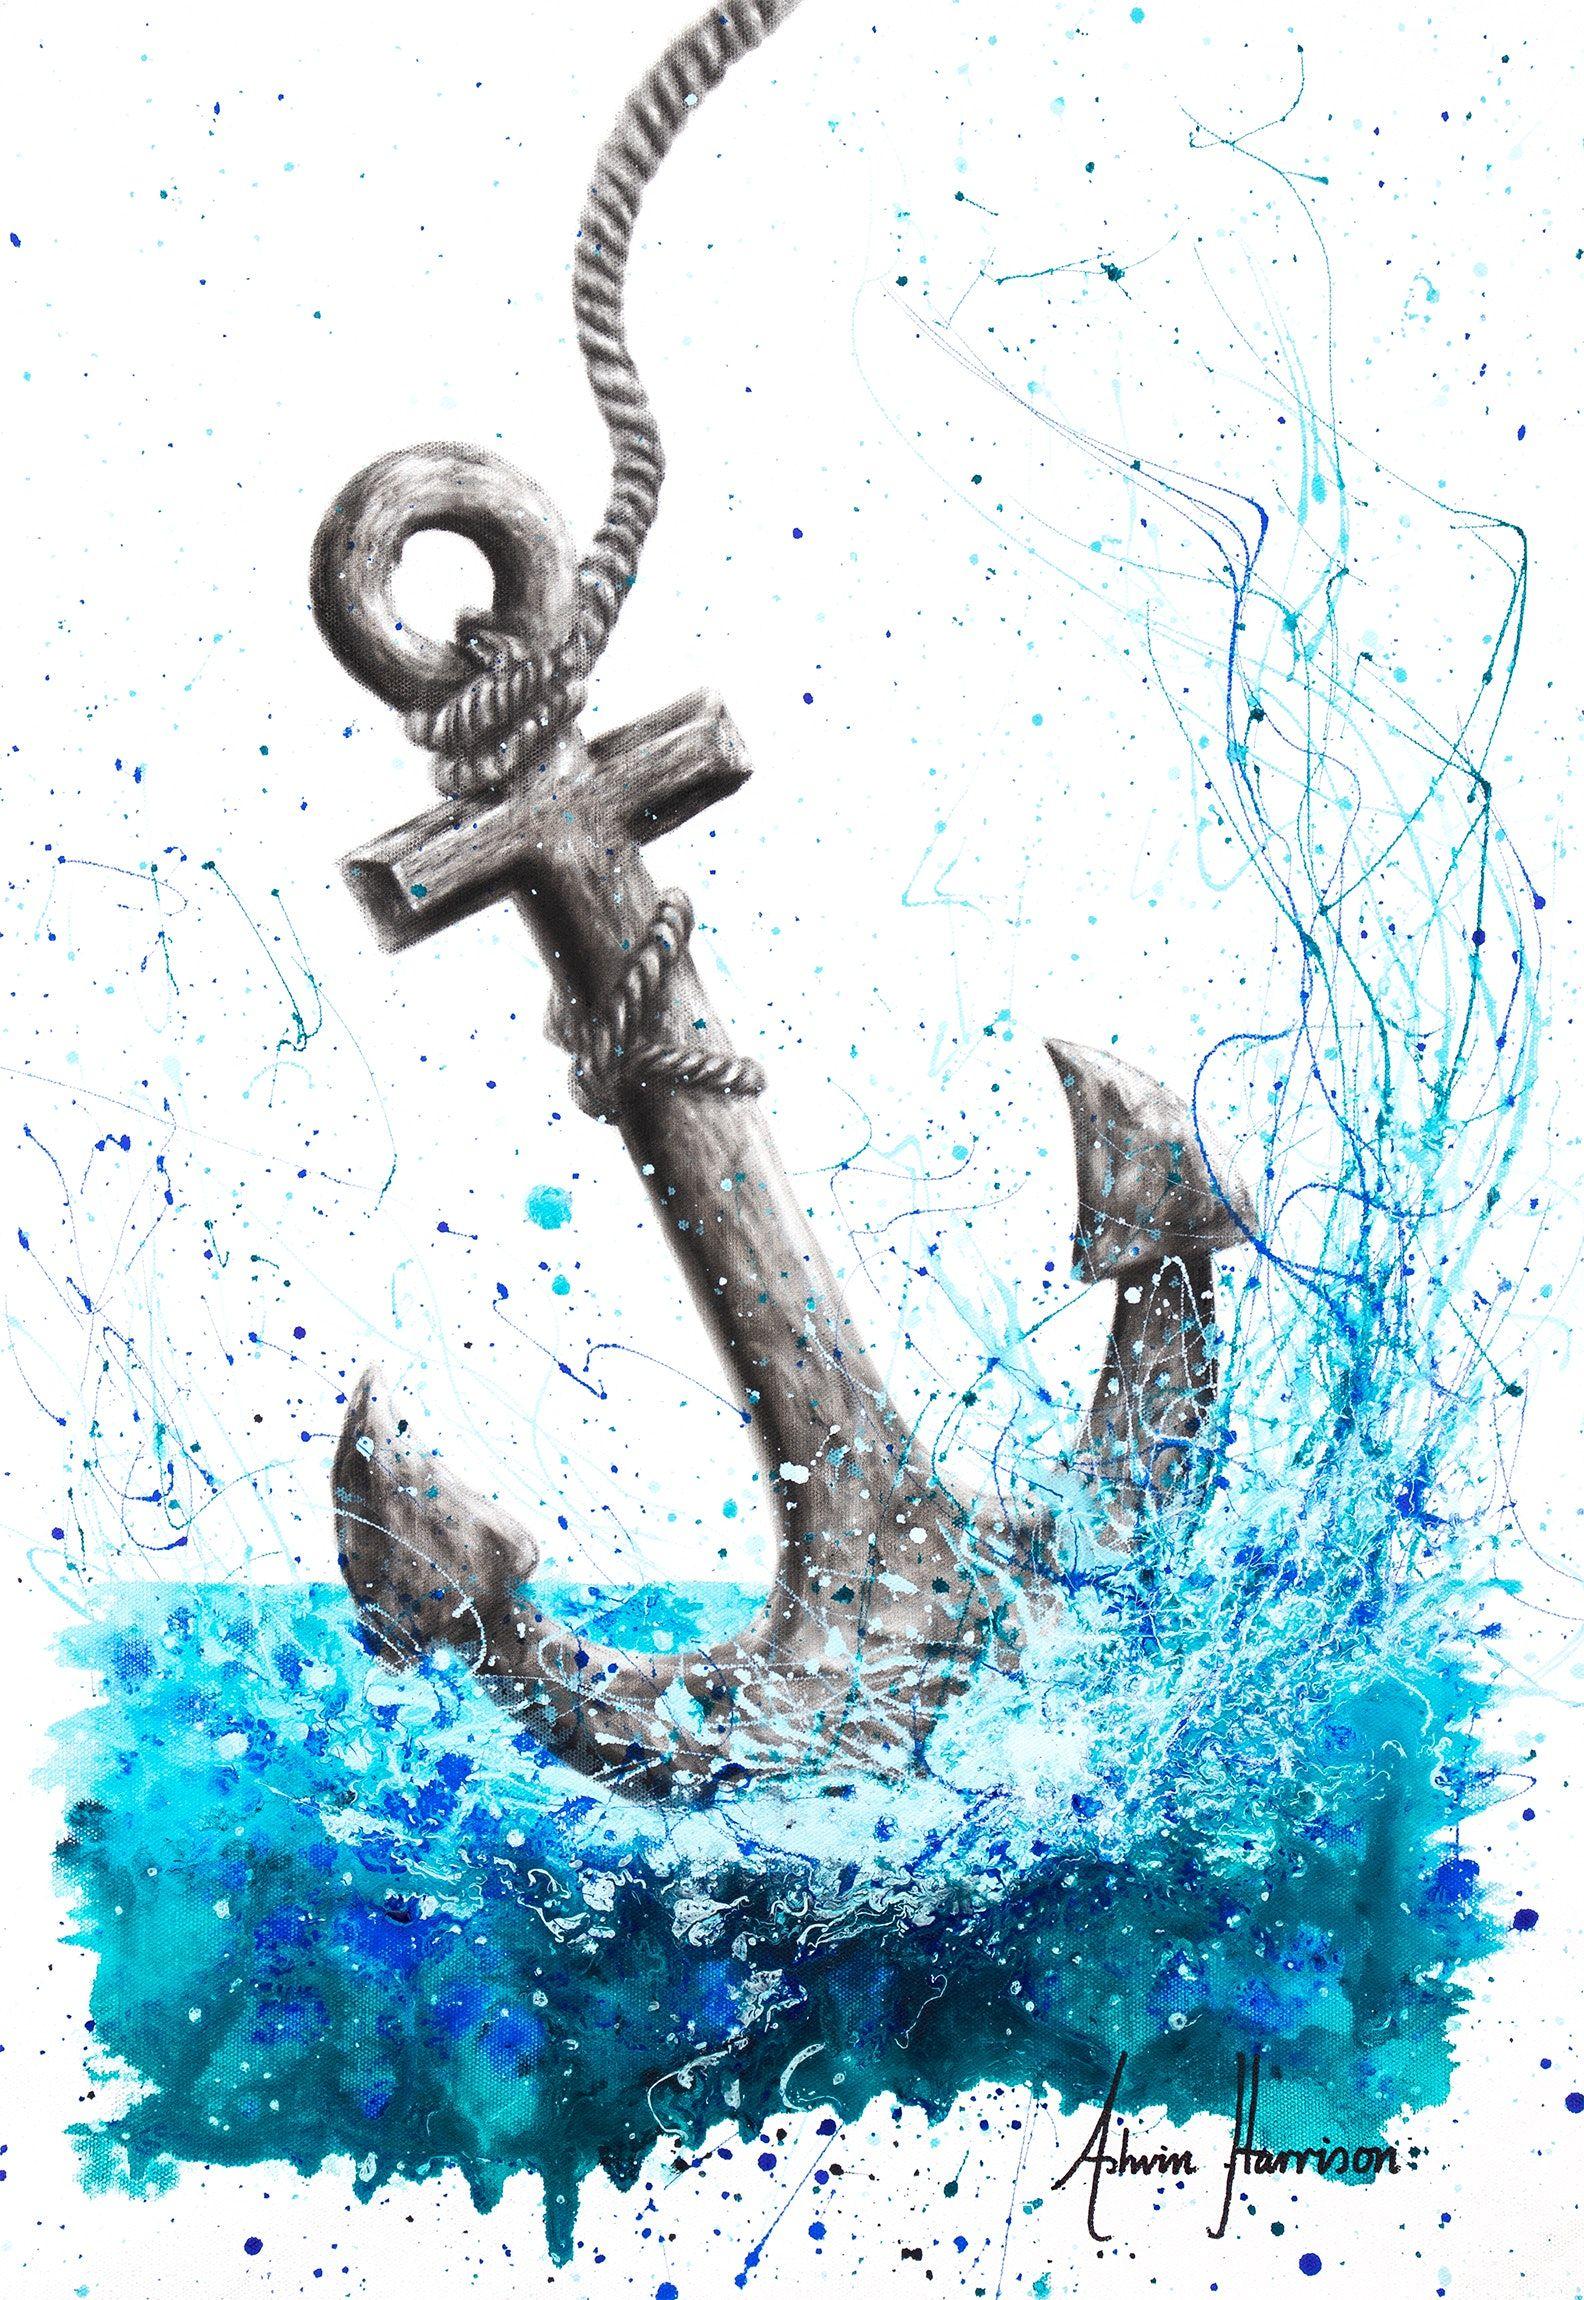 Drift And Anchor In 2020 Anchor Art Anchor Drawings Anchor Wallpaper